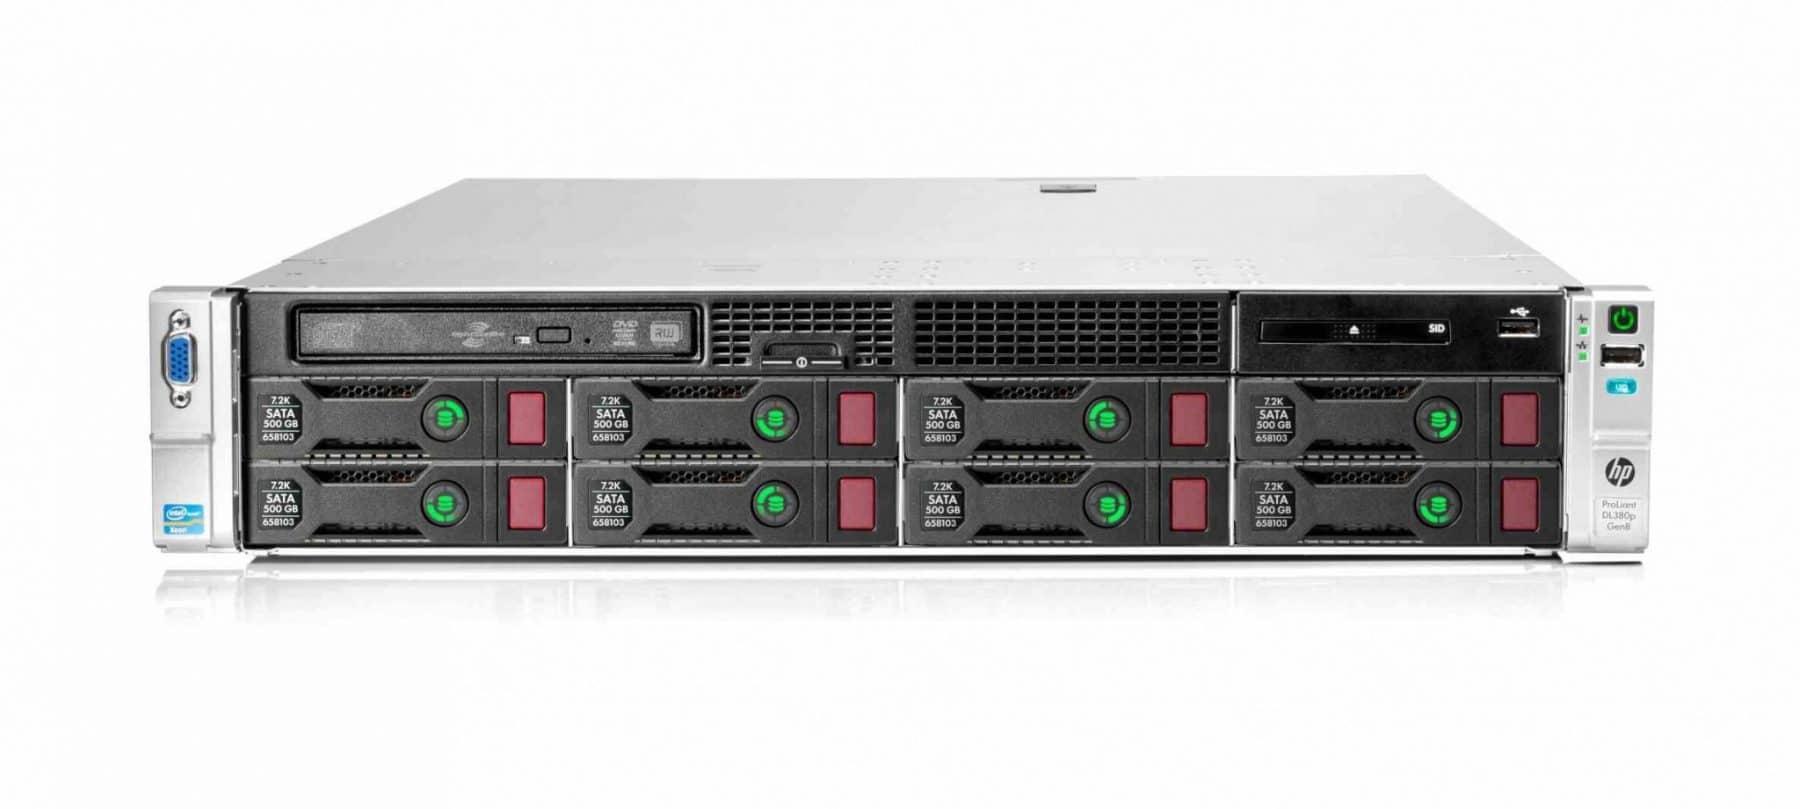 HP-Proliant-DL380P-Server-3-1-2-2-3-1-3-1-1.jpg